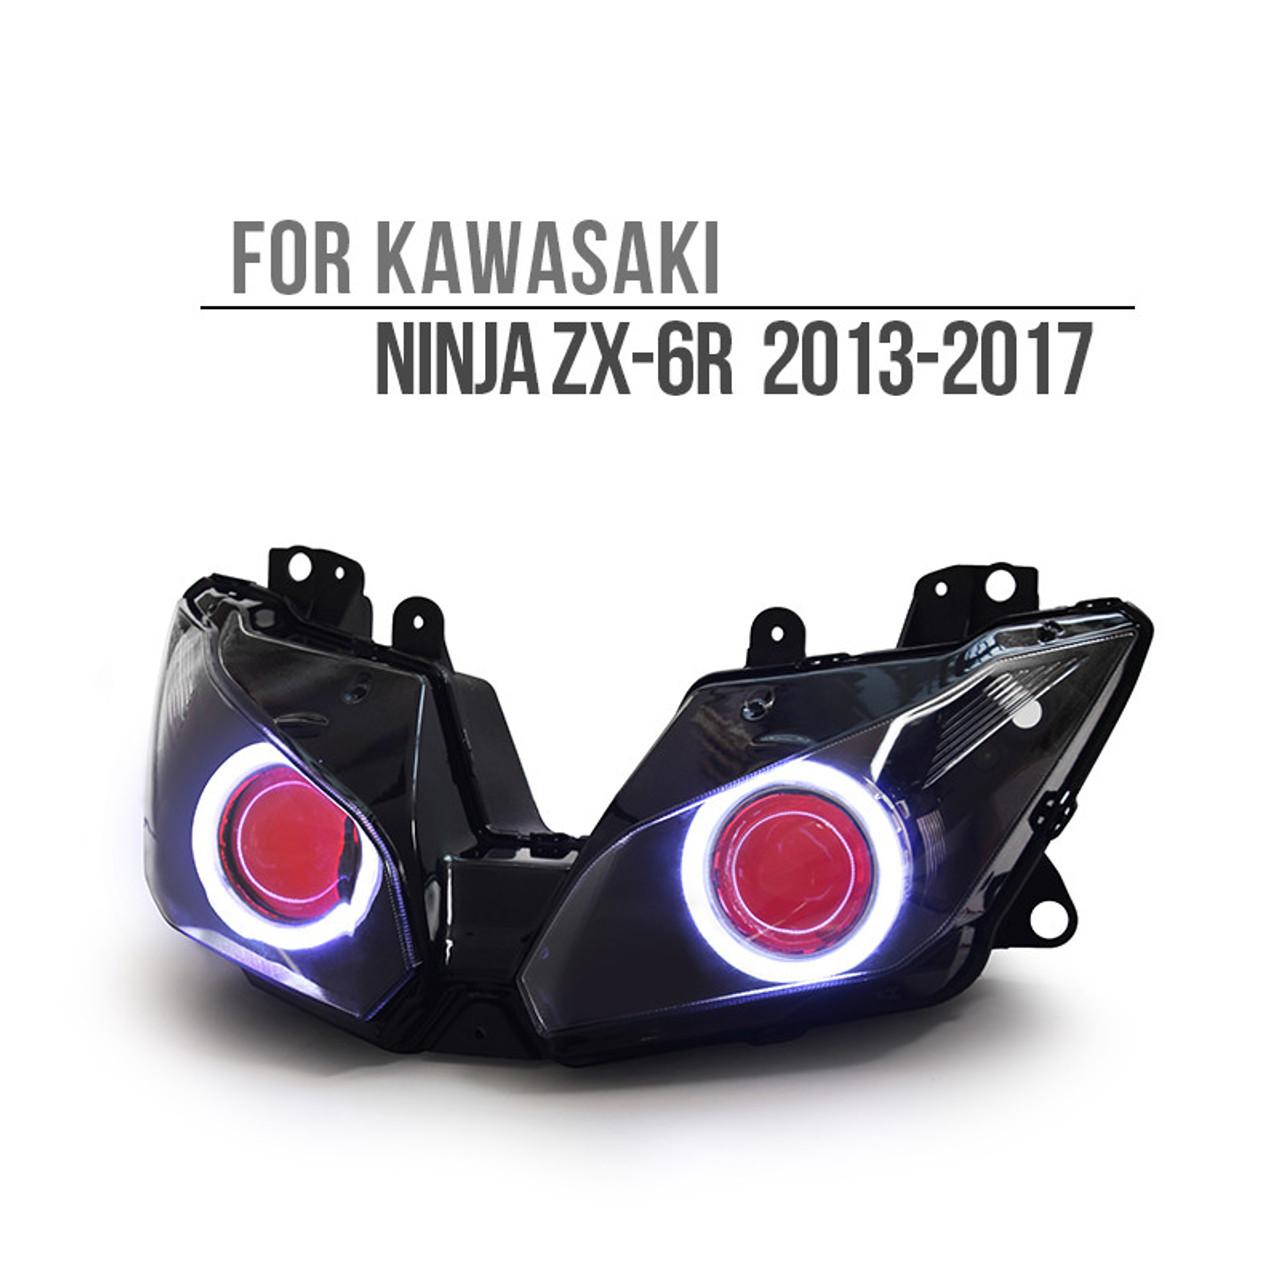 kawasaki ninja zx6r headlight 2013 2014 2015 2016 2017 rh ktmoto com